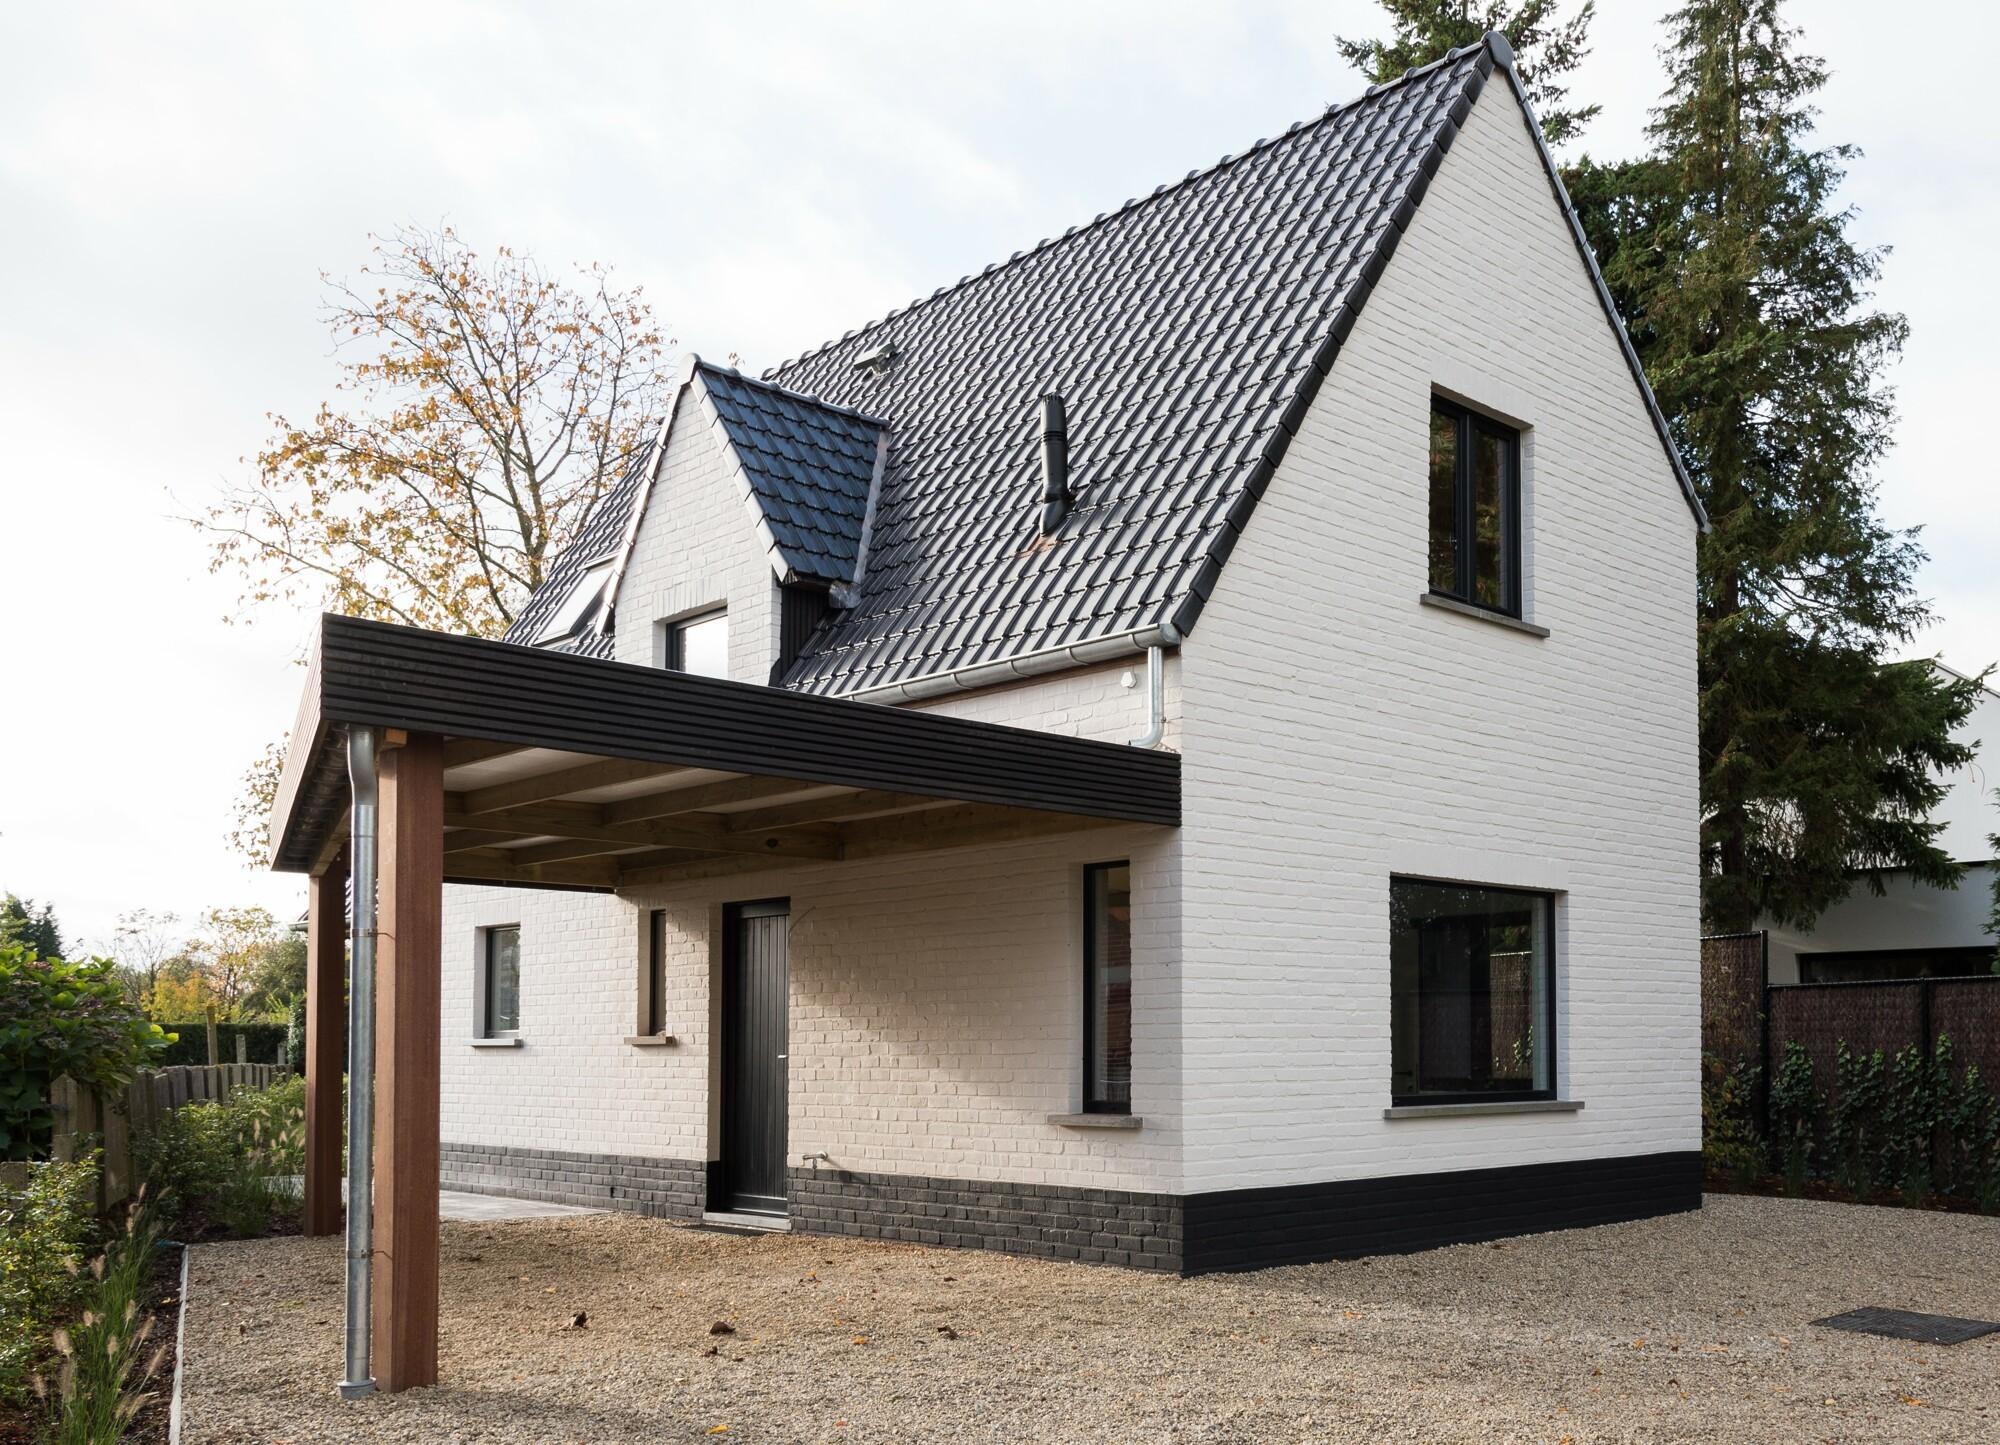 Prachtig gerenoveerde alleenstaande woning